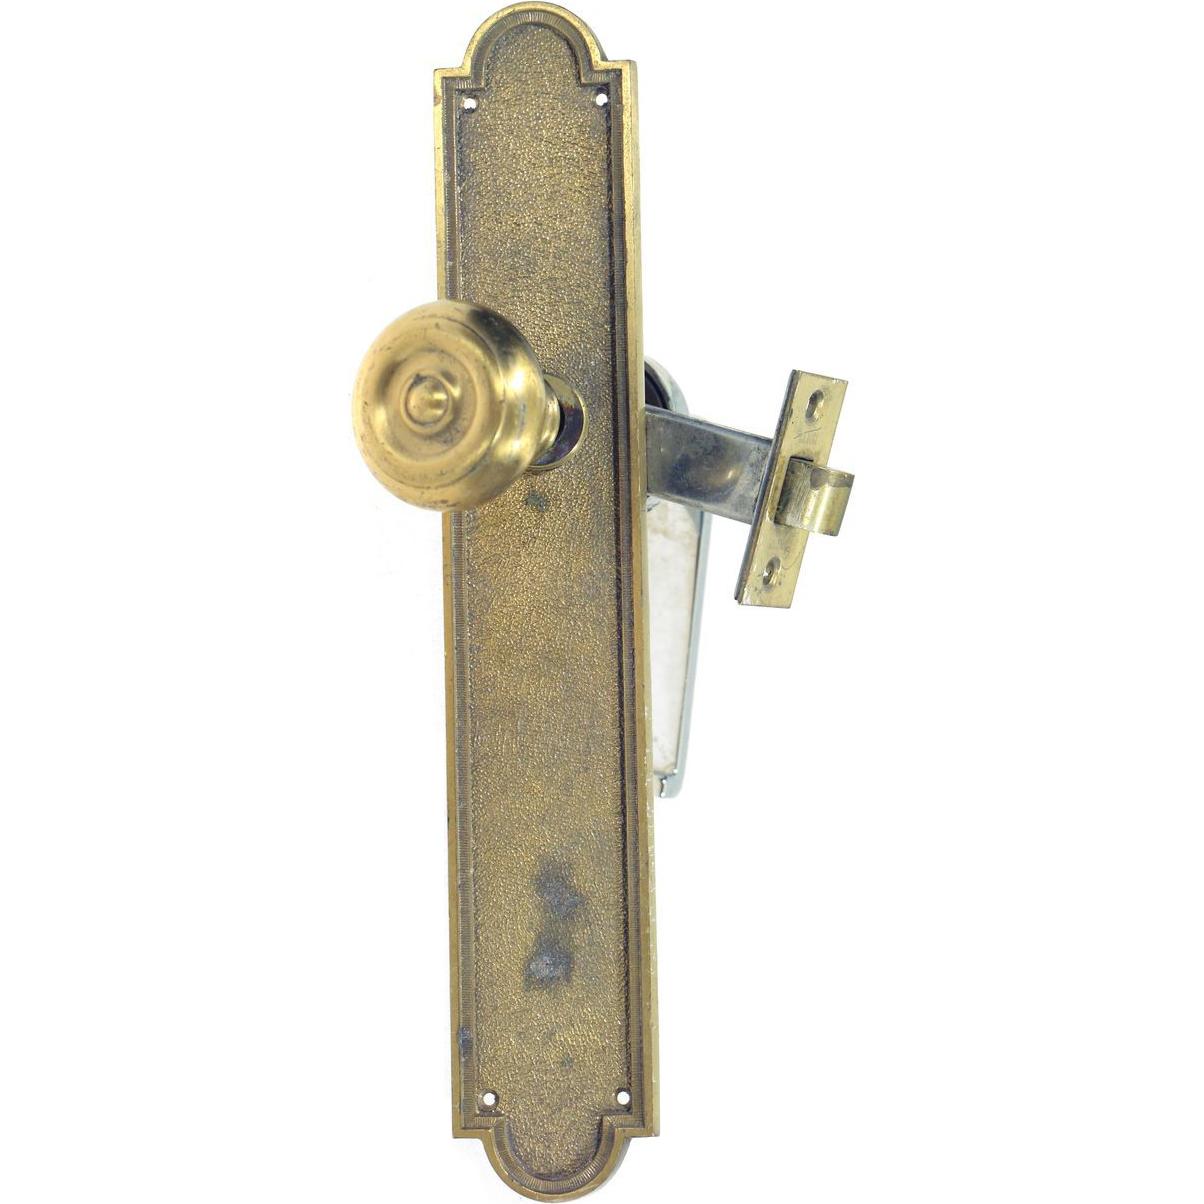 Bulls eye brass knob and chrome lever set